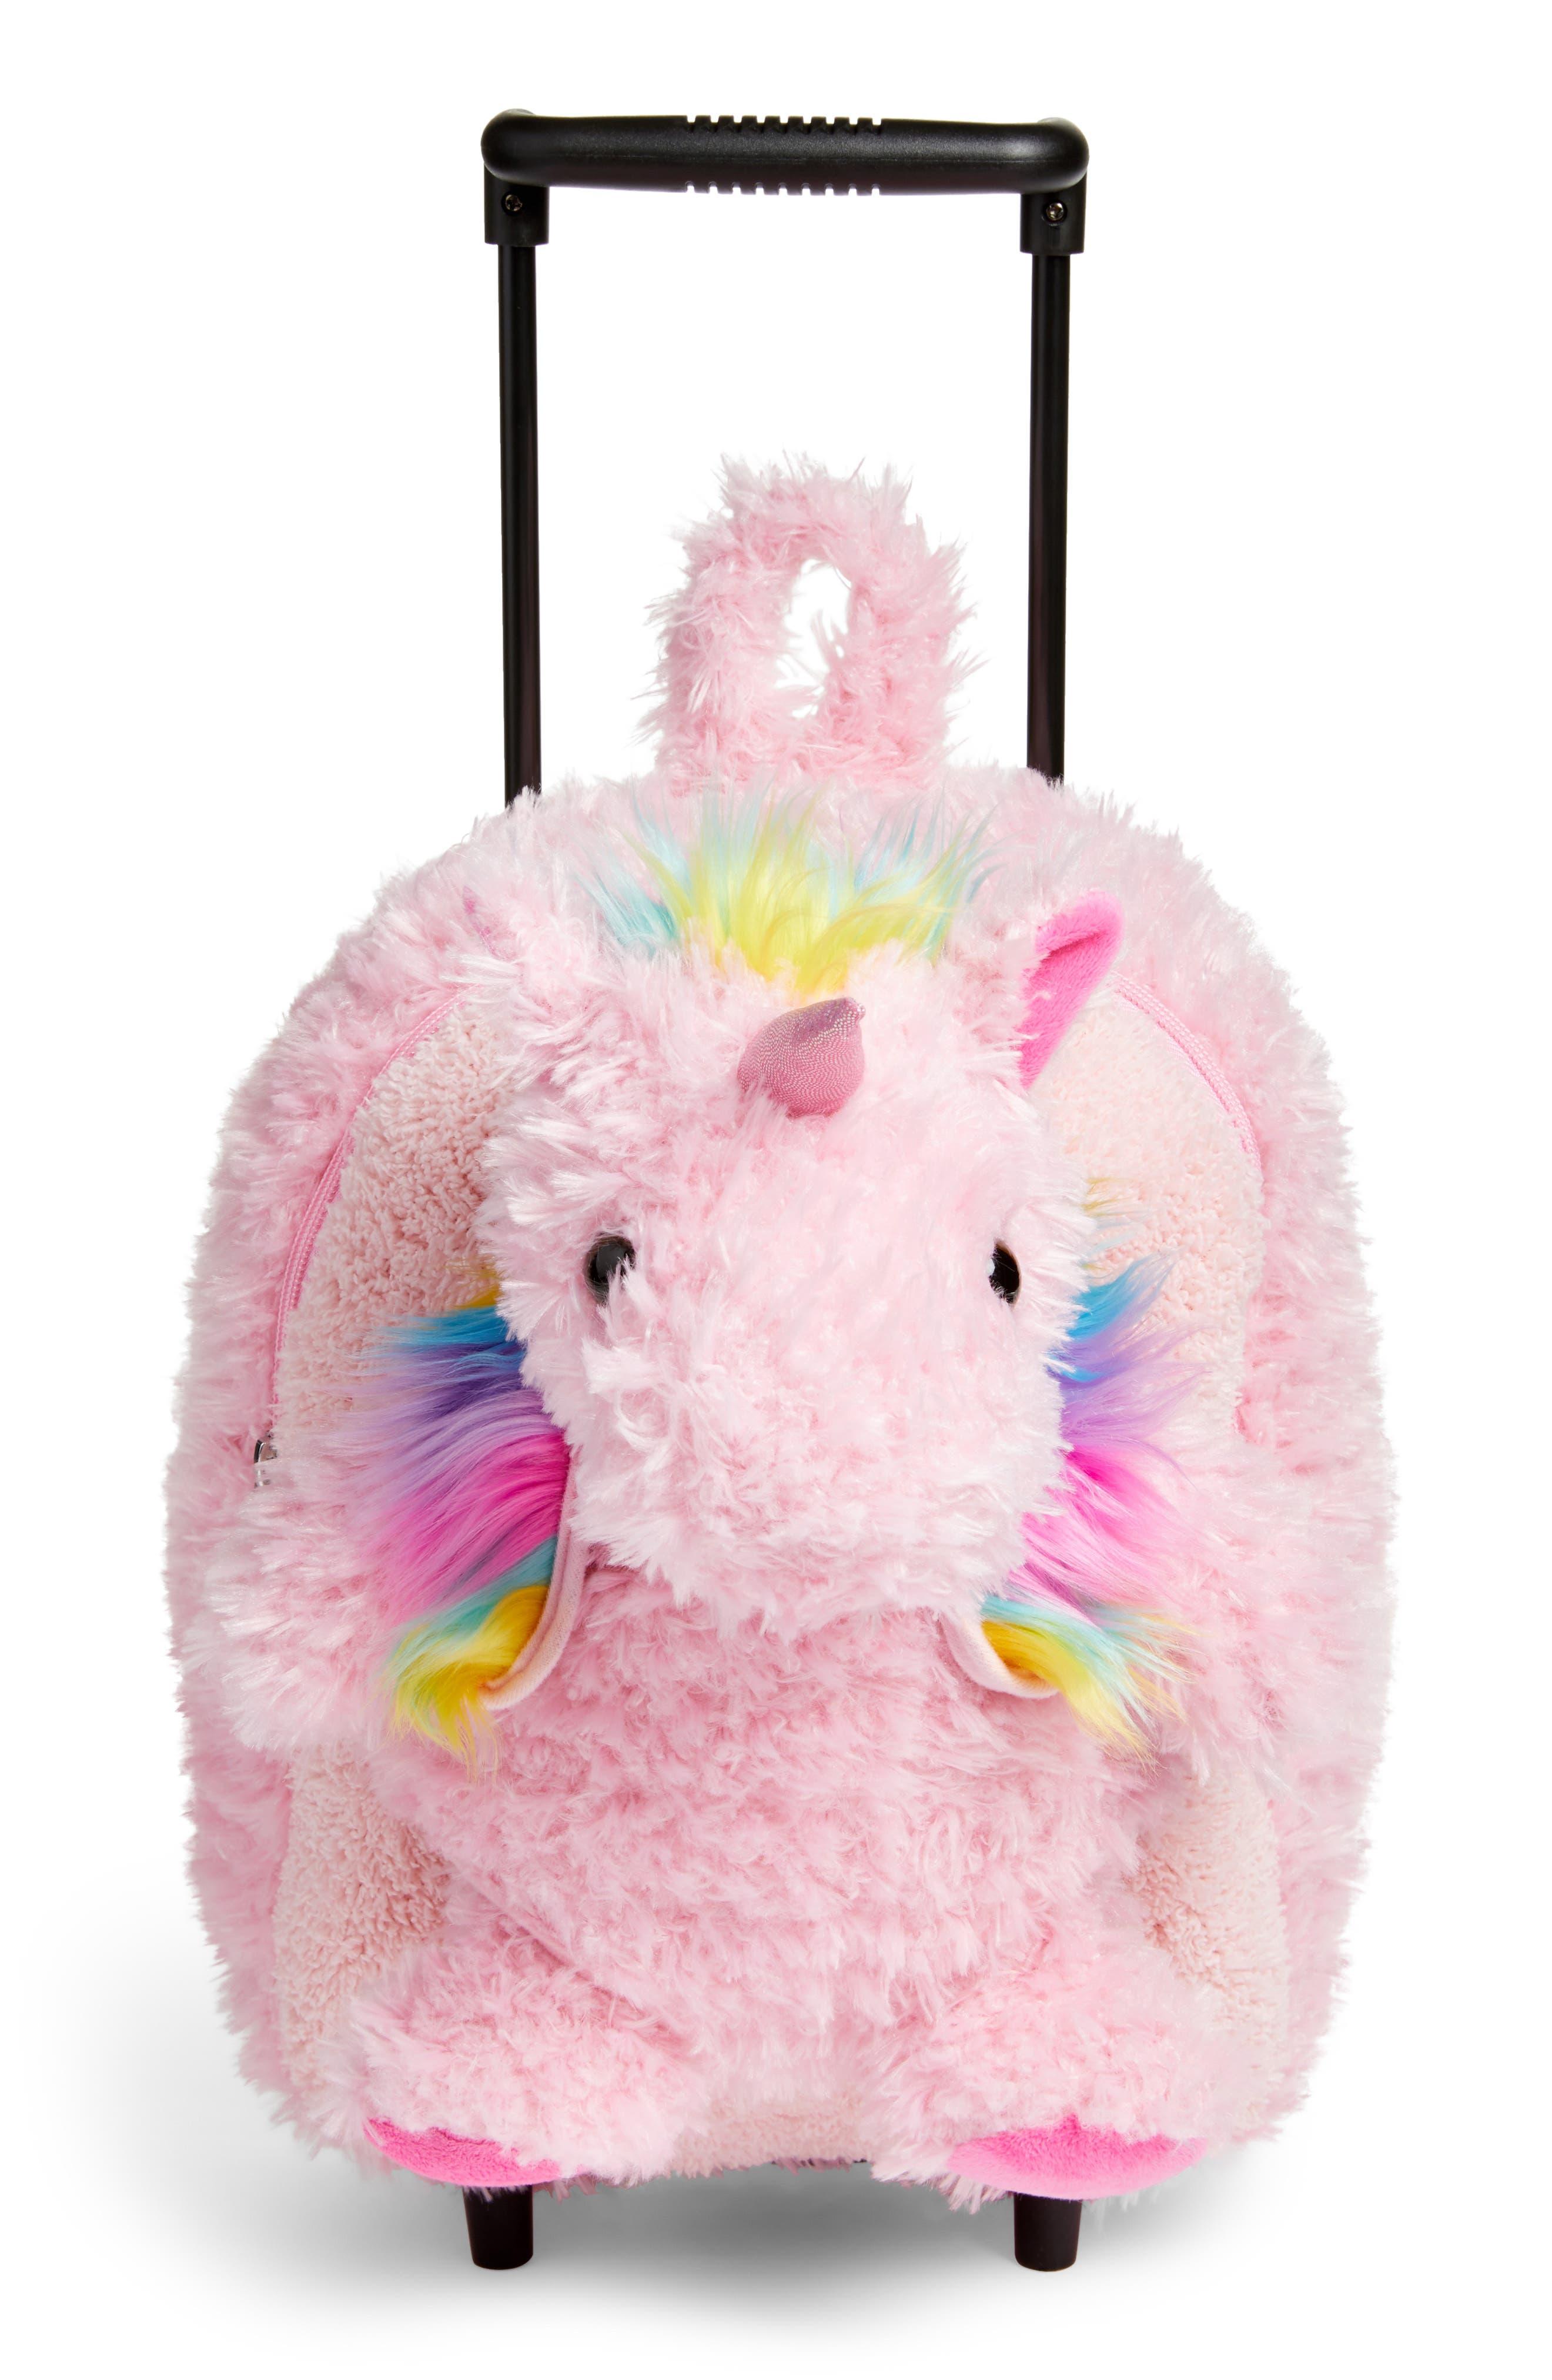 Alternate Image 1 Selected - Popatu Unicorn Trolley Rolling Backpack (Kids)